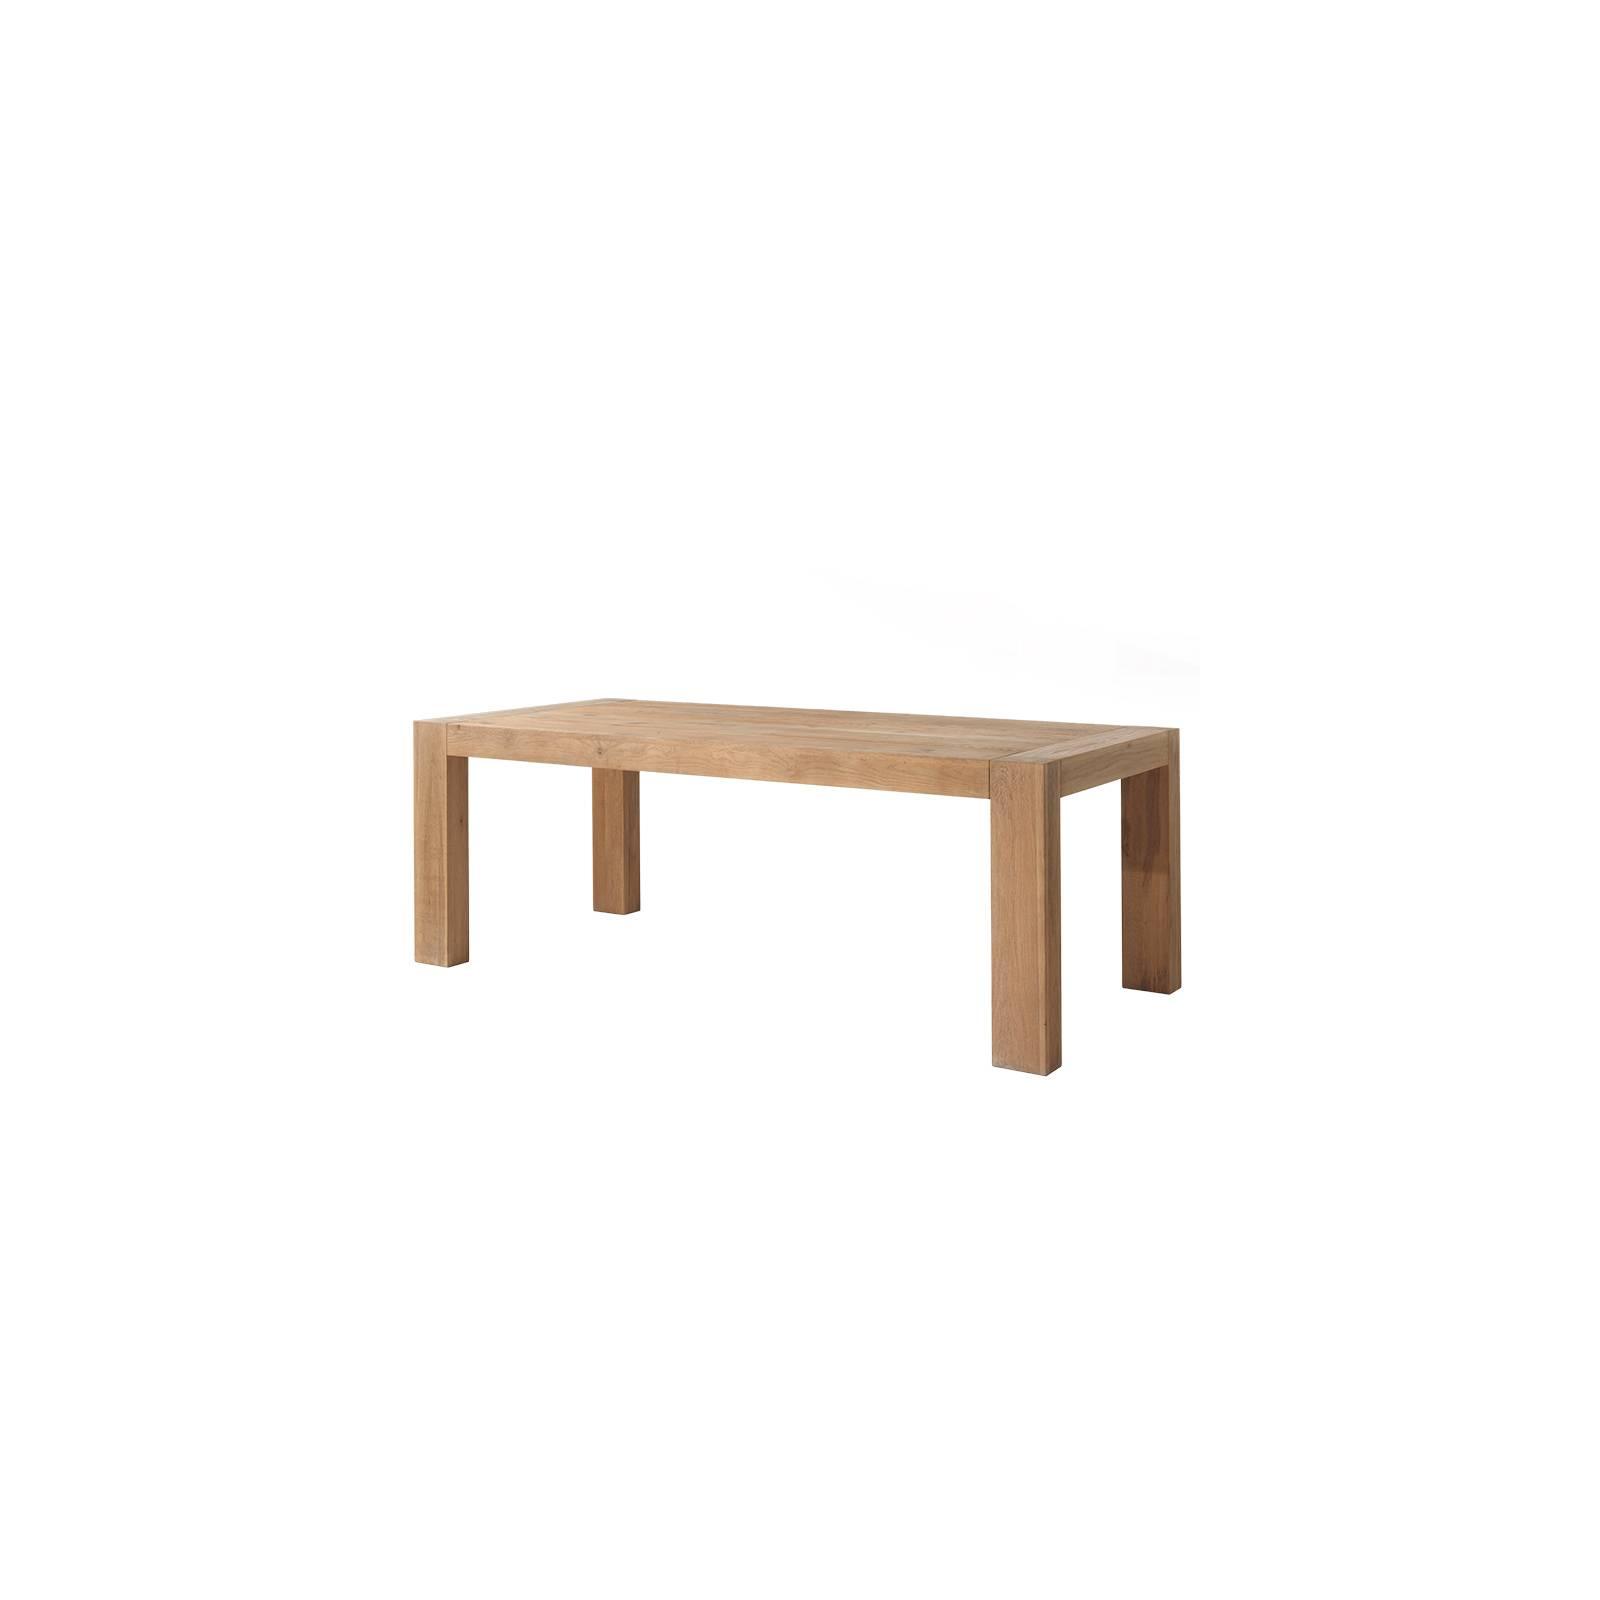 Table de Repas Zeus - meuble haut de gamme